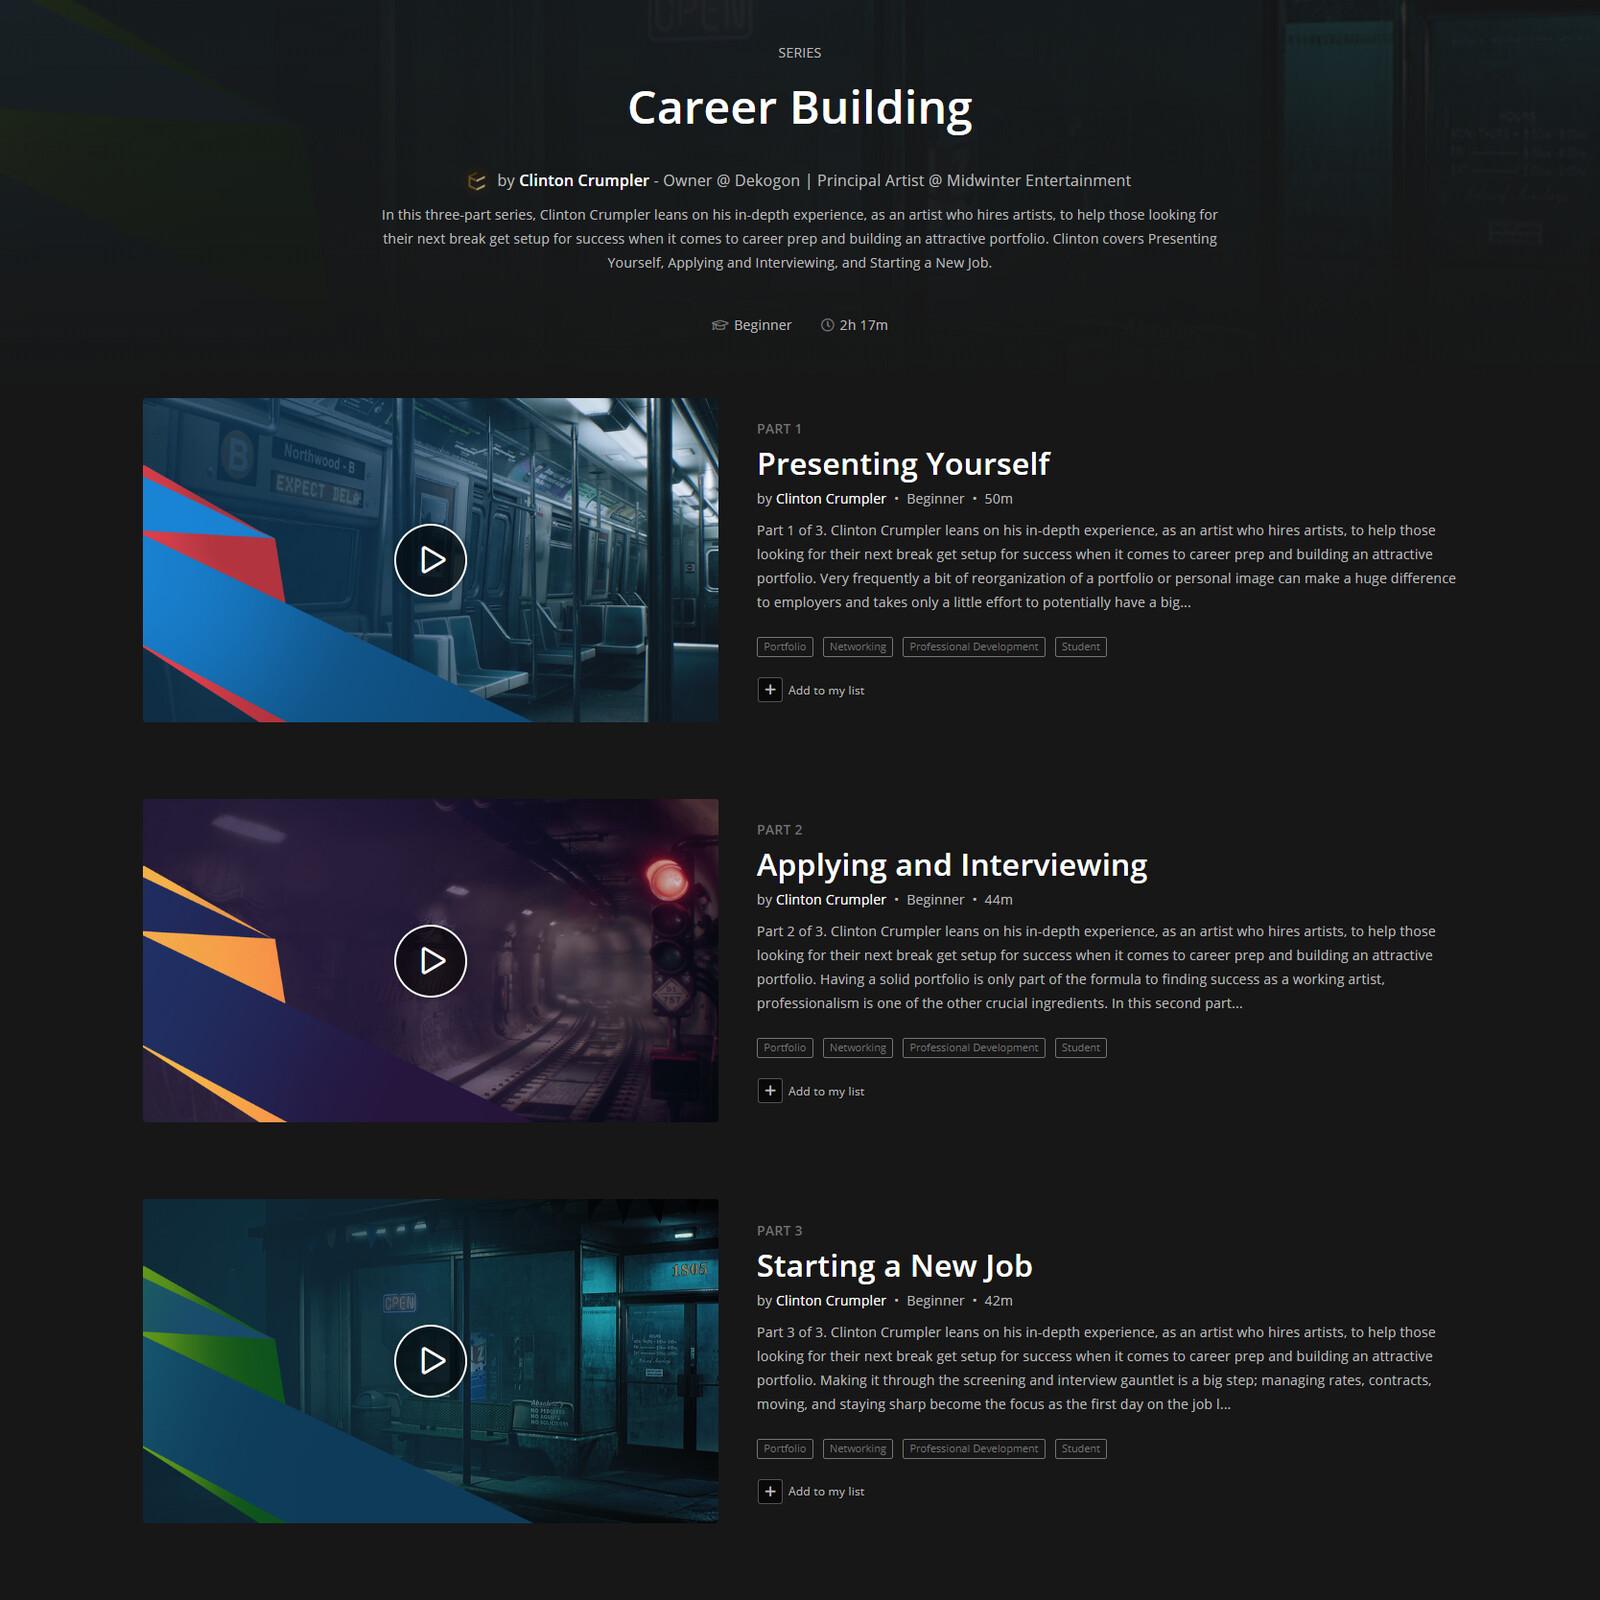 https://www.artstation.com/learning/series/lZ/career-building